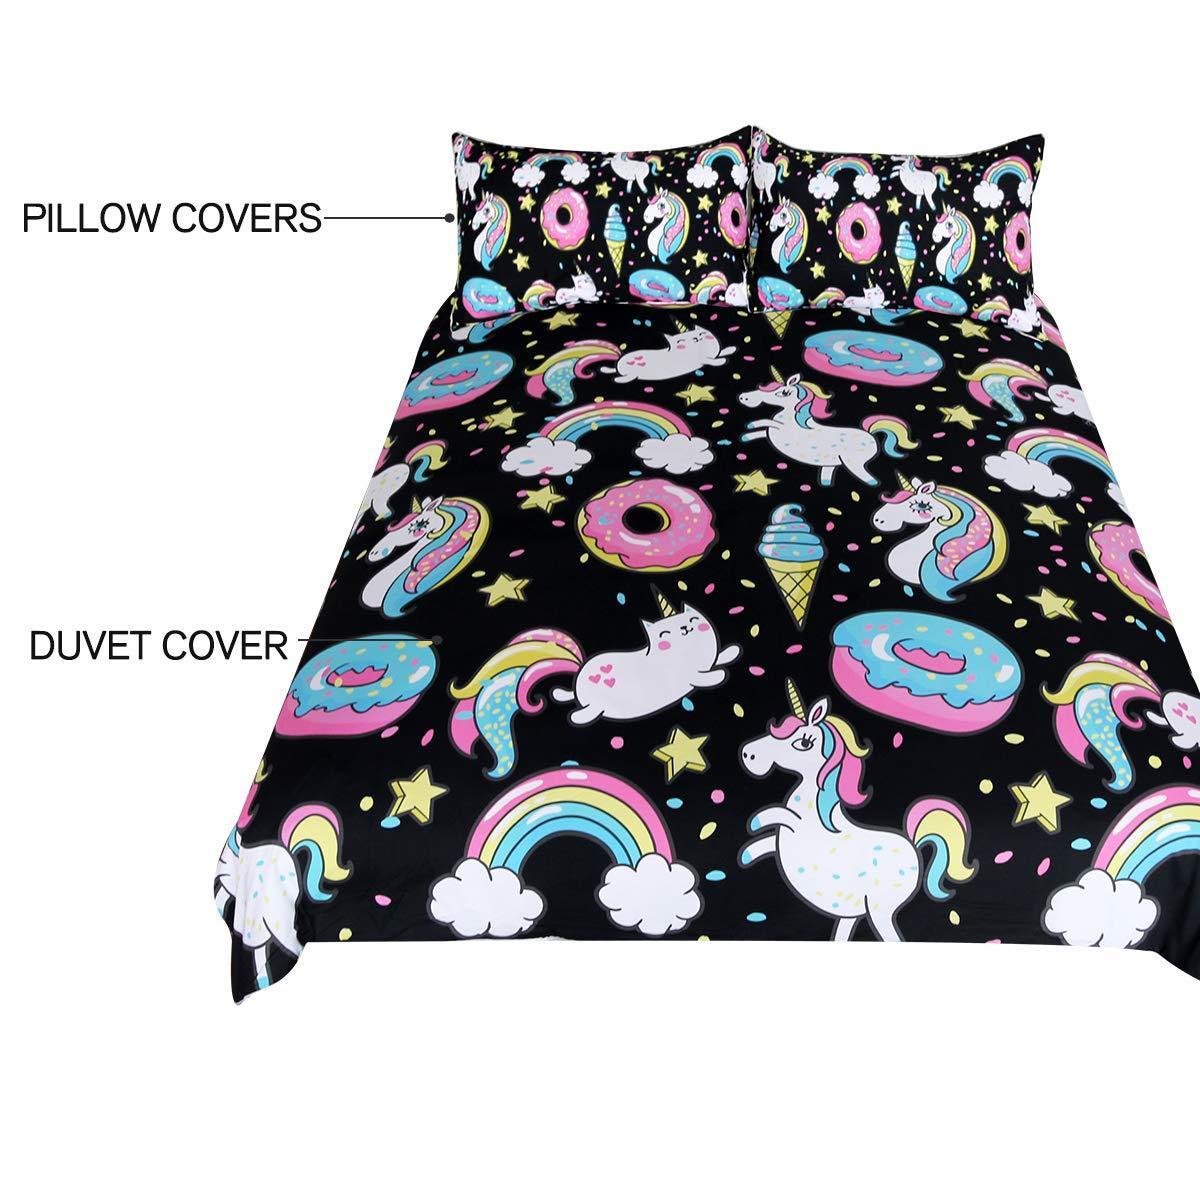 Kingtex Twin ARIGHTEX Unicorn Floral Bedding Unicorn Woodland Fantasy Art Duvet Cover Kids Girls Dark Blue 3 Piece Rainbow Pegasus Horse Bed Sets